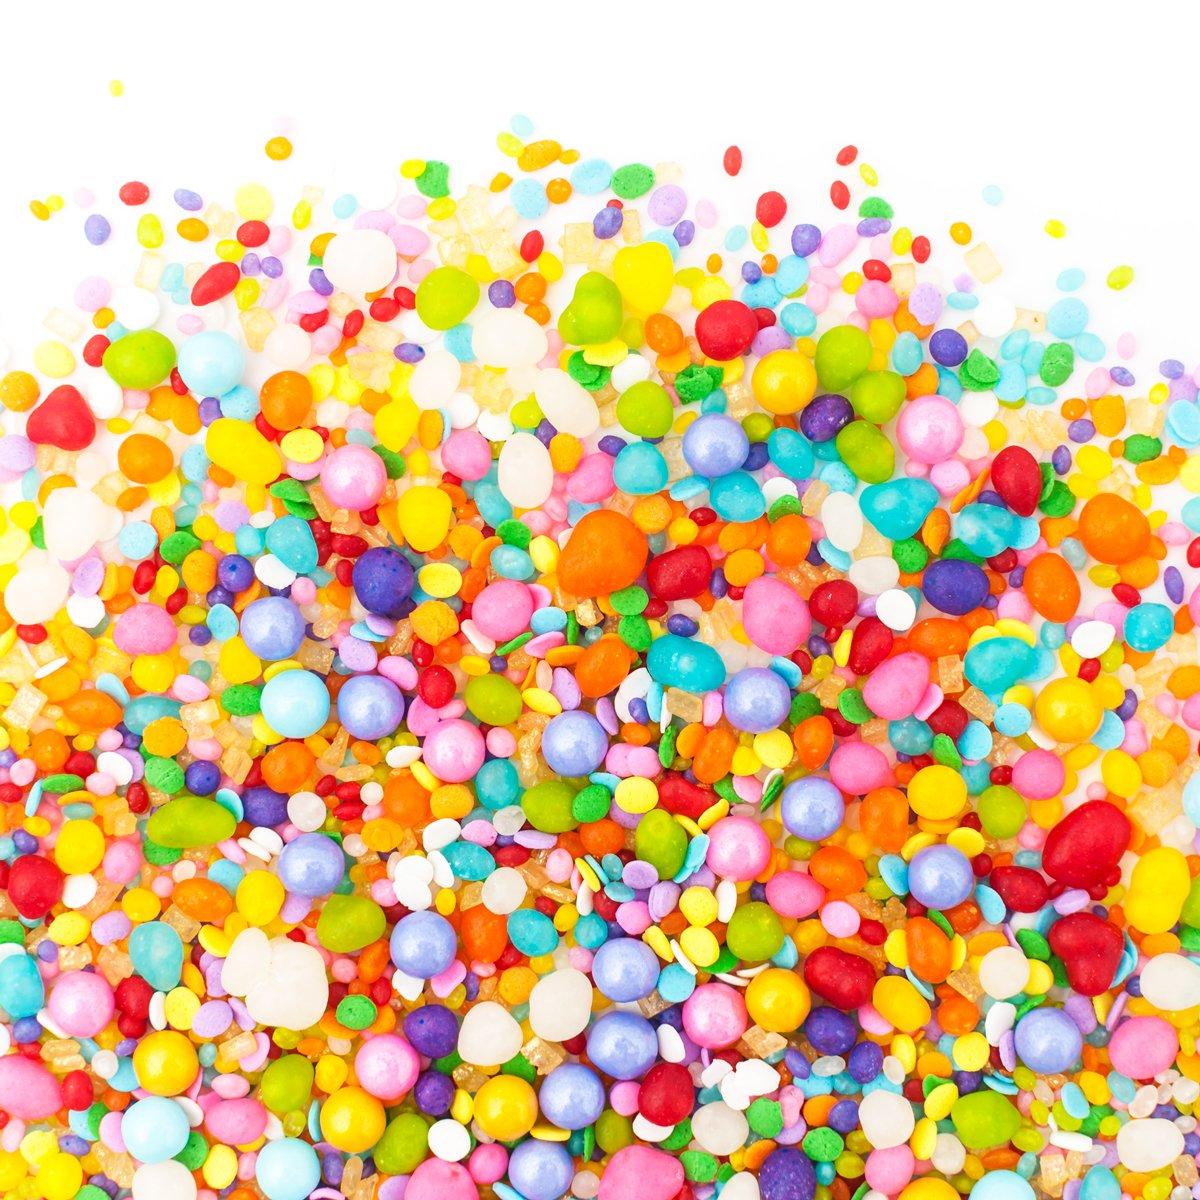 Candy Sprinkles | Unicorn Candyfetti | 8oz Jar | Rainbow Fruity | MADE IN THE USA! | Edible Confetti